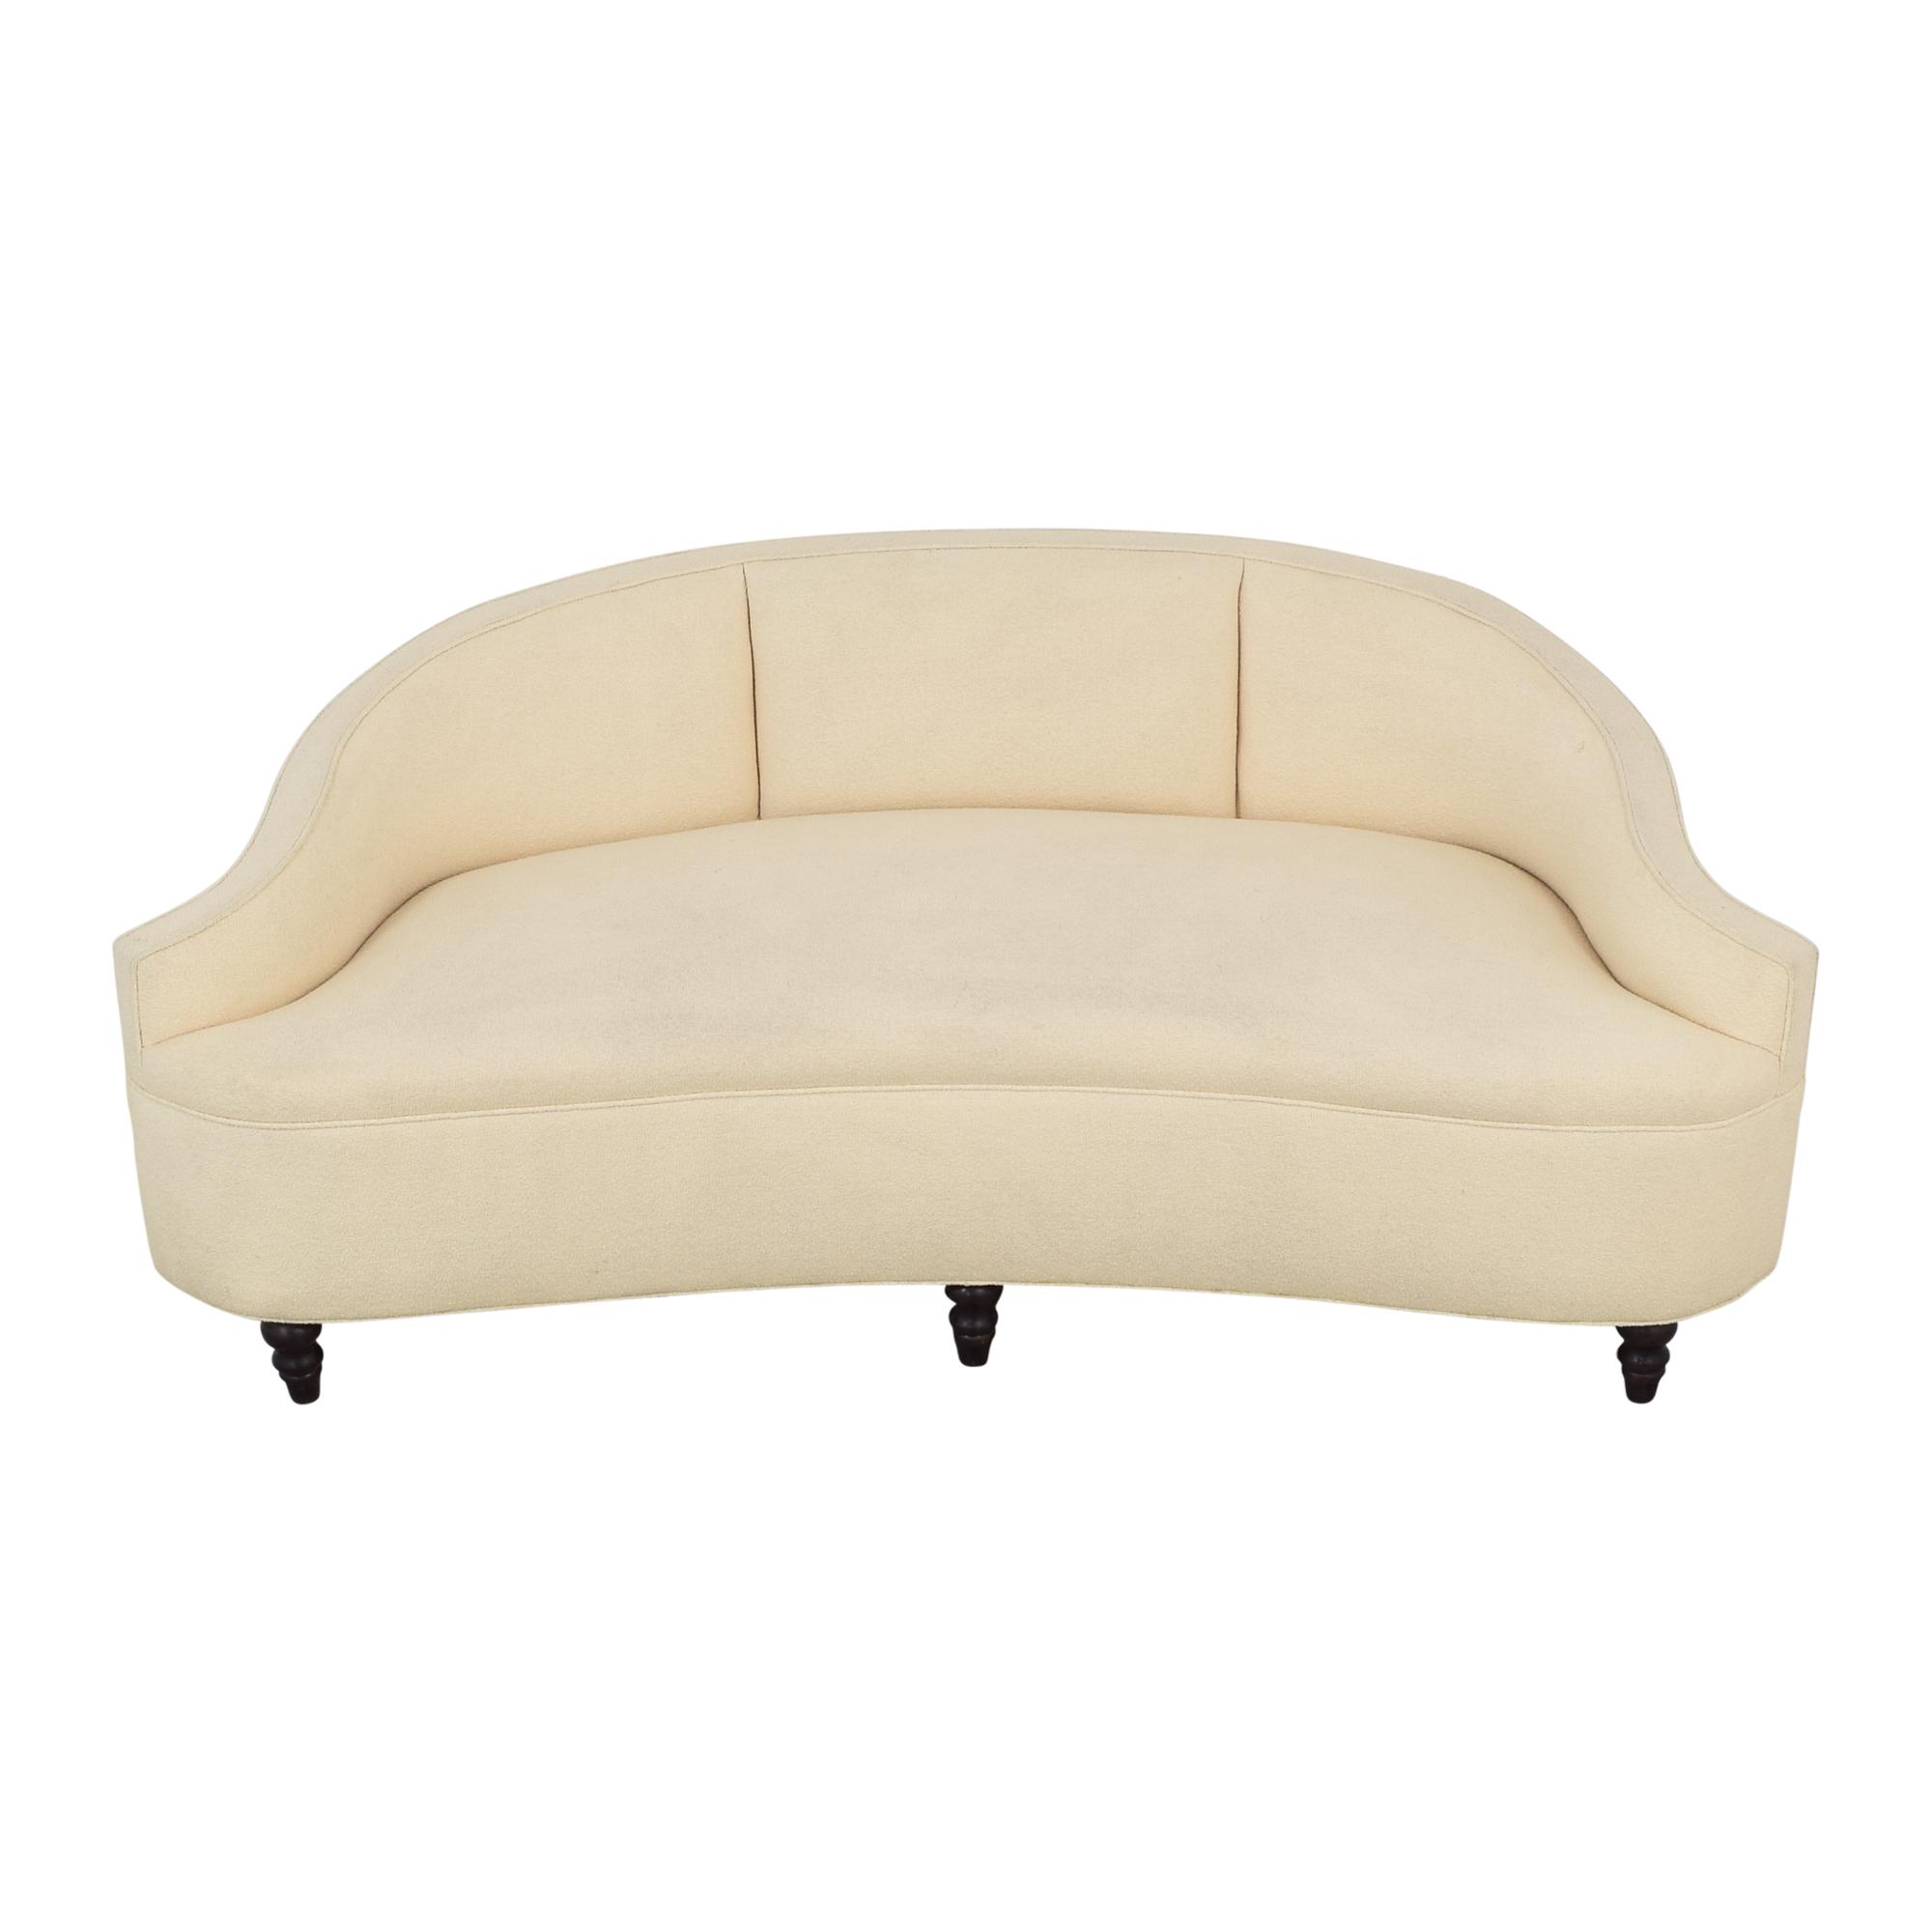 Summer Hill Crescent Upholstered Sofa nj